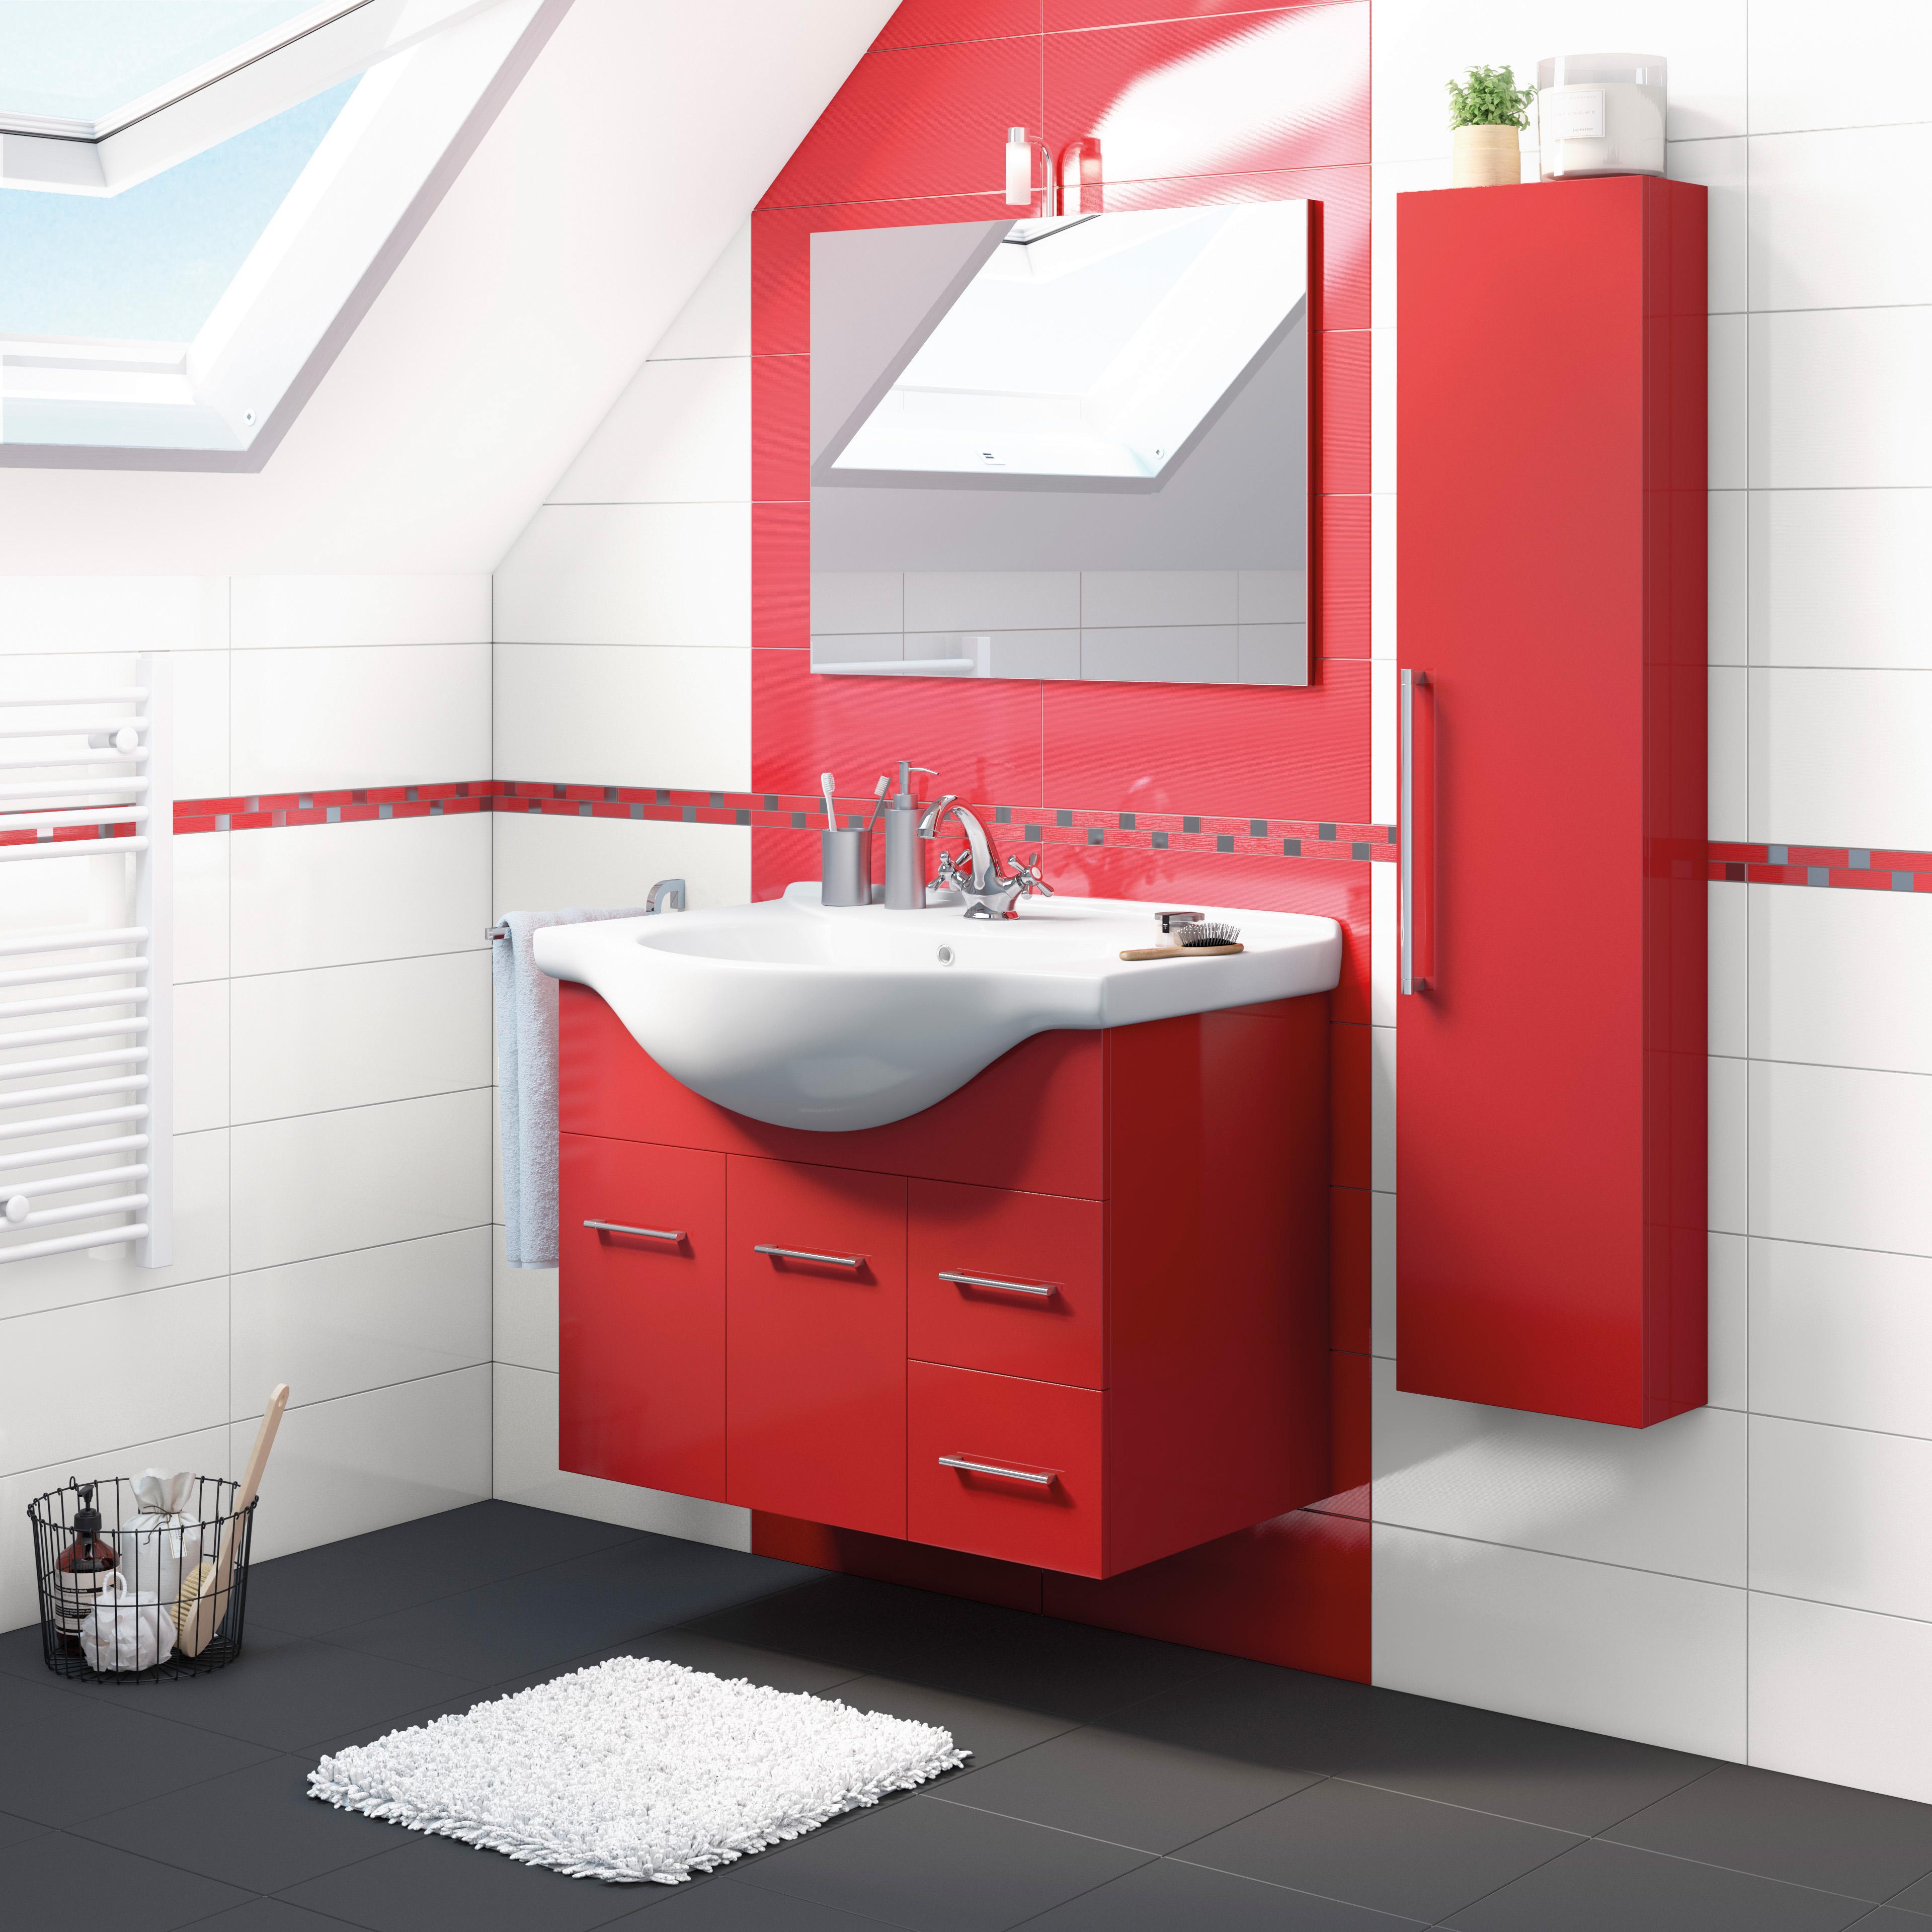 Emejing Mobile Bagno Rosso Images - Home Design Ideas 2017 ...